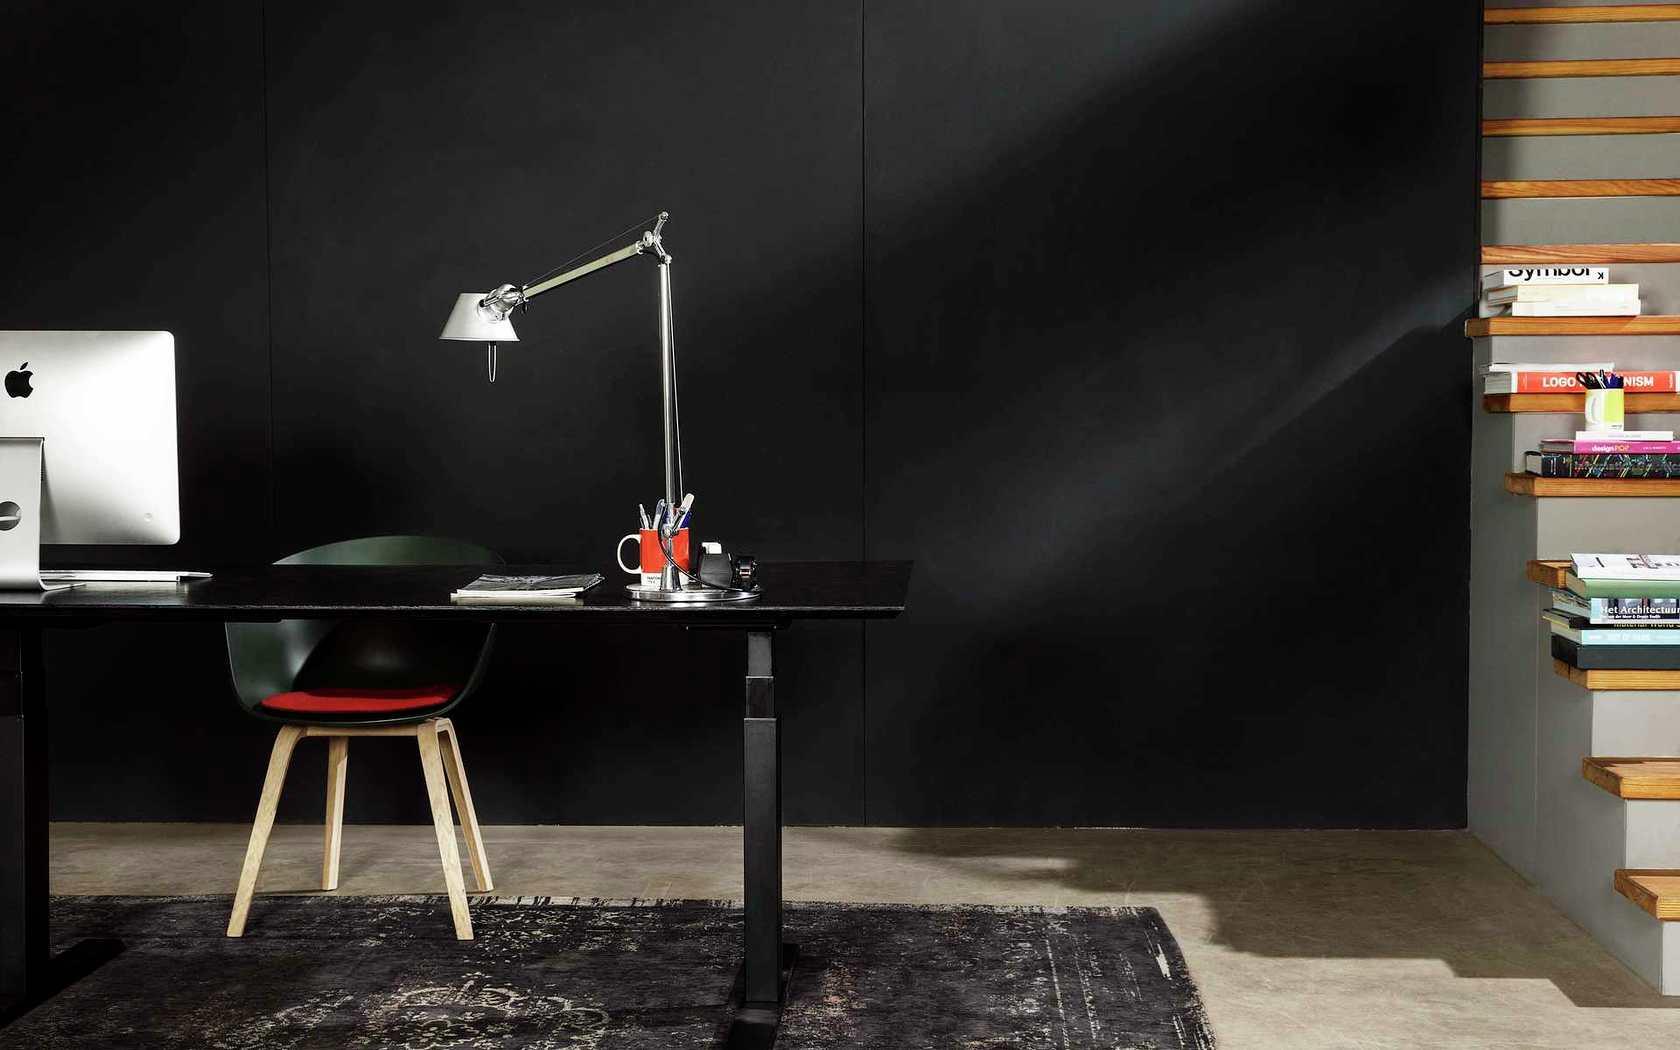 магазин мебели онлайн Хотьково